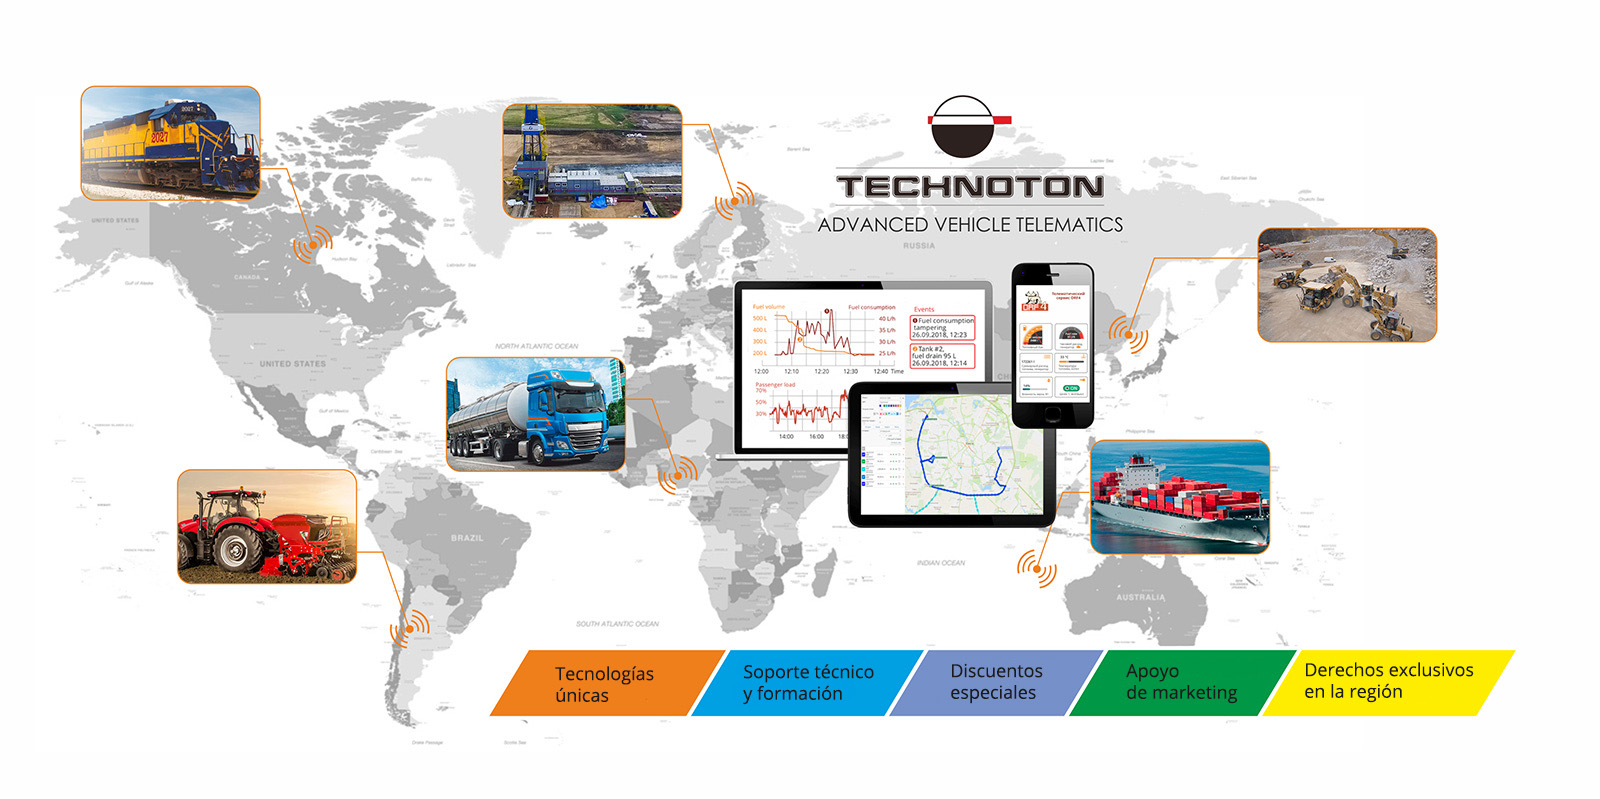 Telemática avanzada de vehículos.. Programa de concesión de Technoton